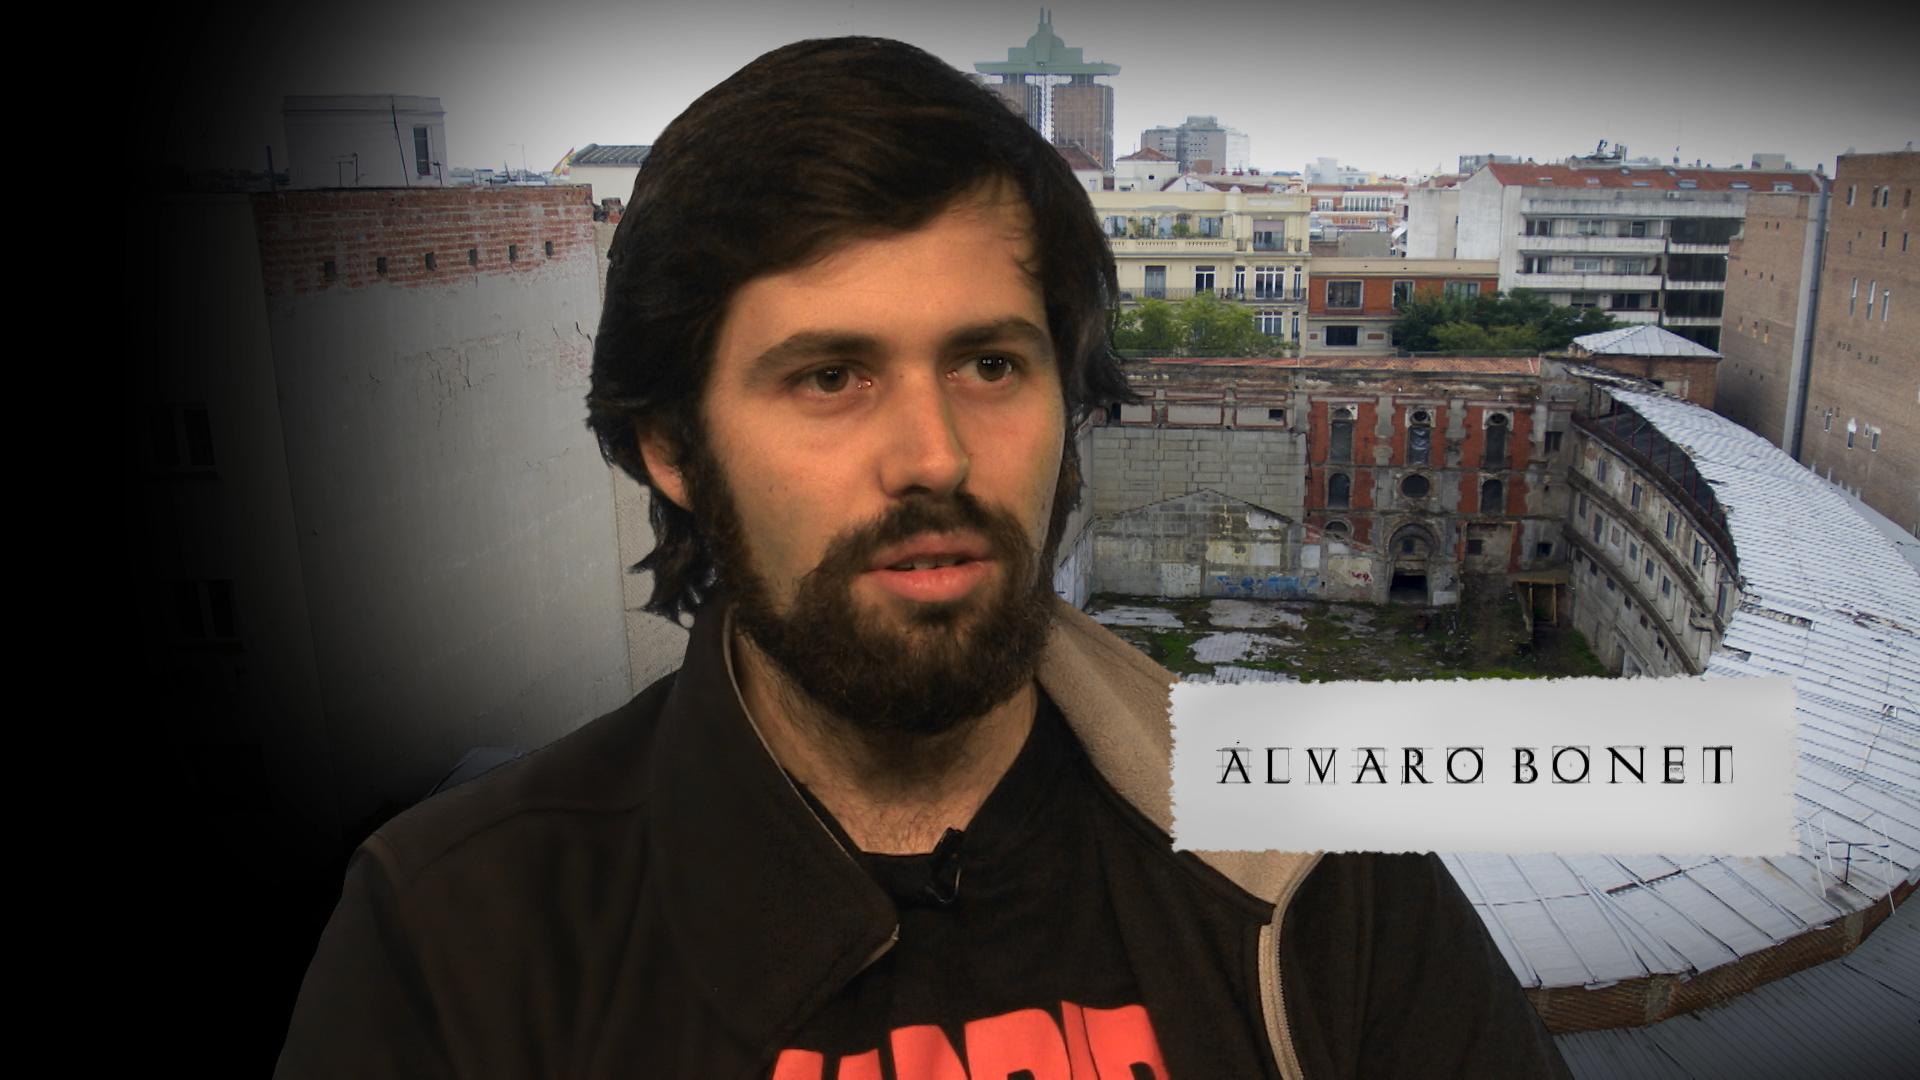 Álvaro Bonet